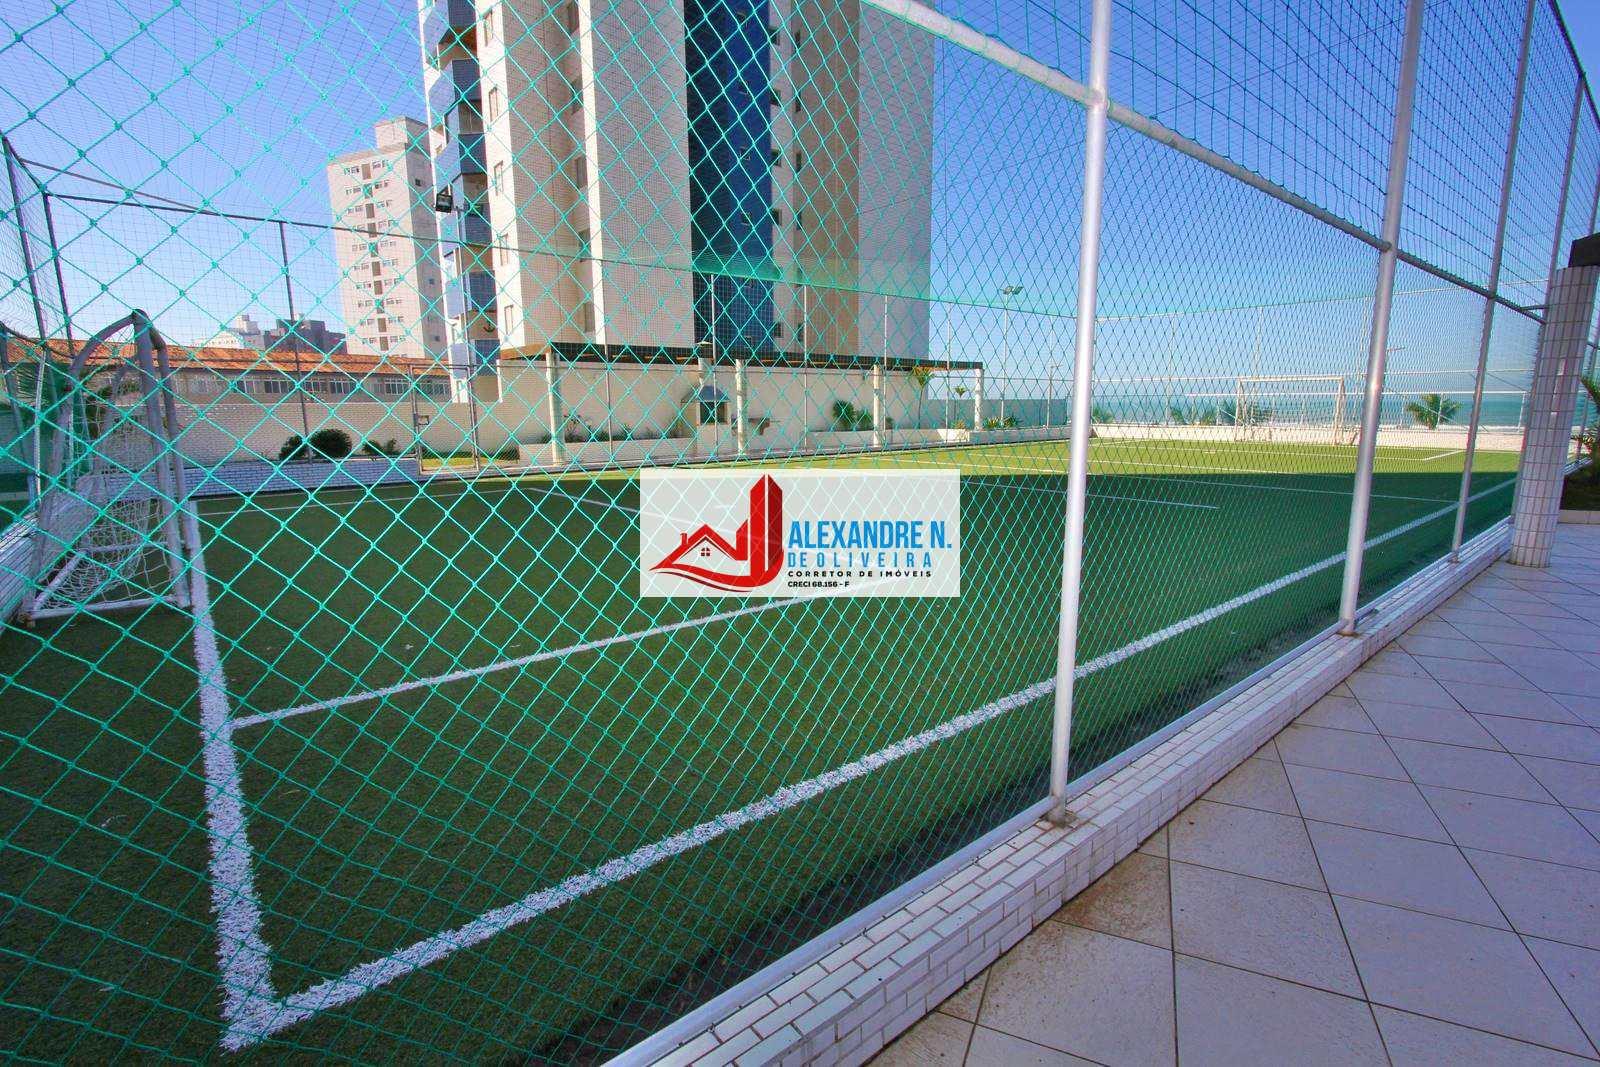 Apartamento 3 dorms, Mirim, Praia Grande - R$ 580 mil, AP00341